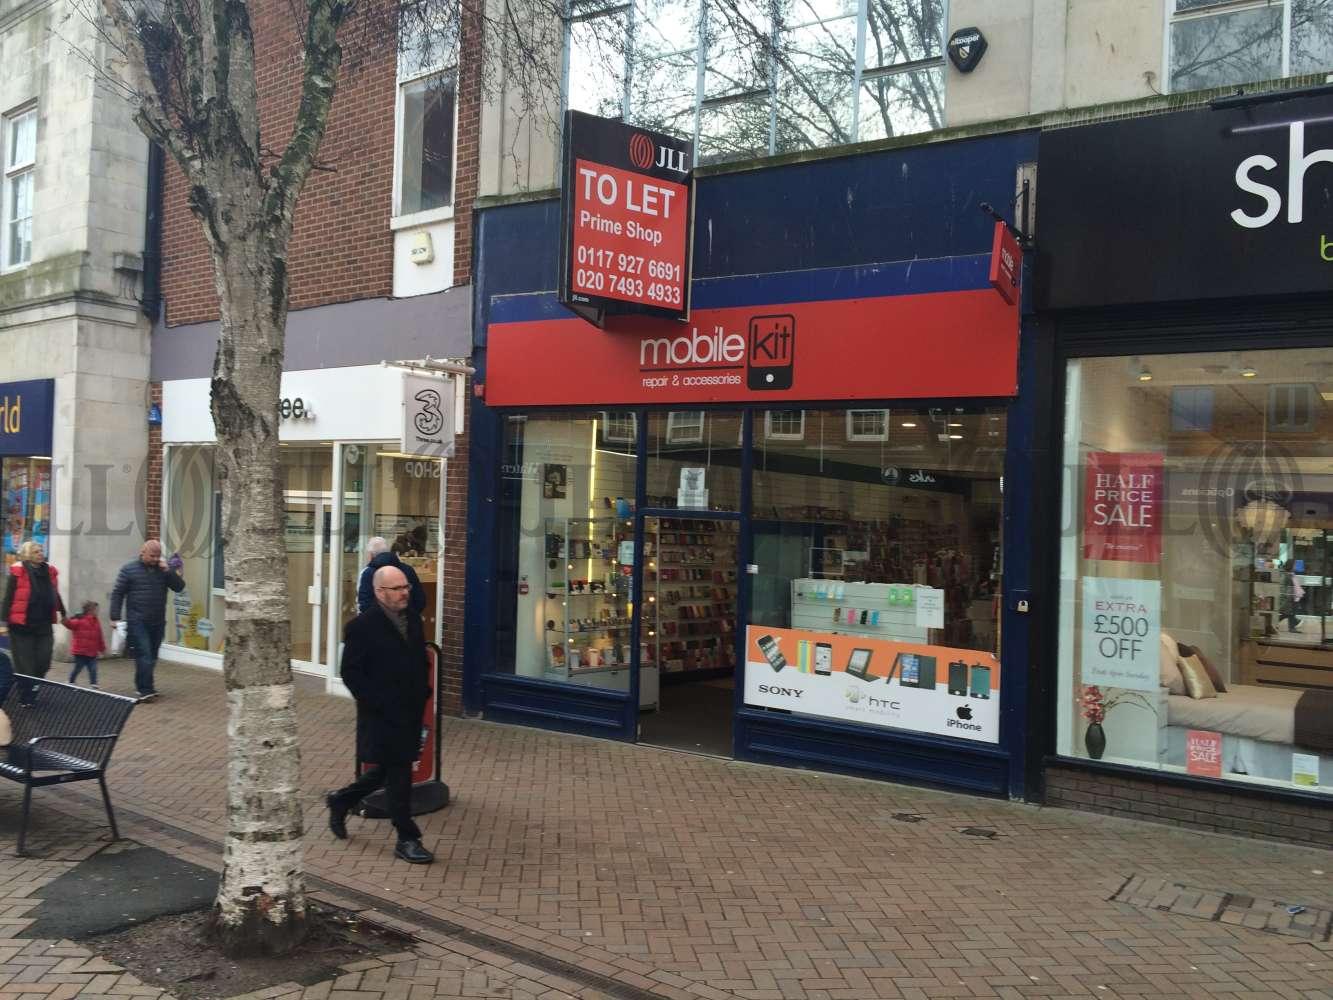 Retail high street Gloucester, GL1 1PD - Unit 1, St Michael's Building